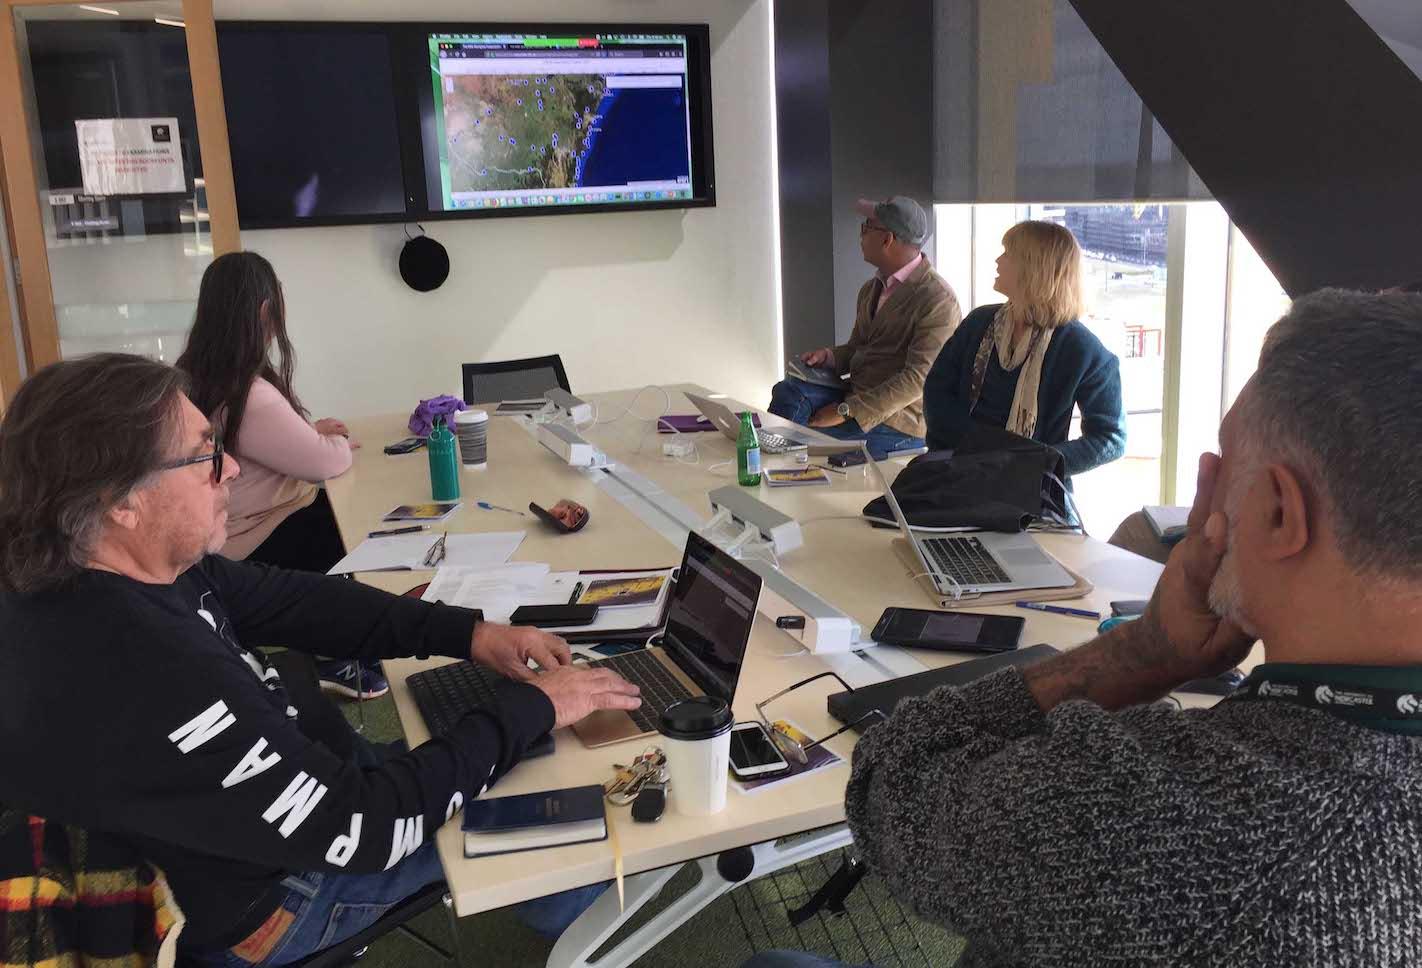 Chief Investigators looking at the digital map